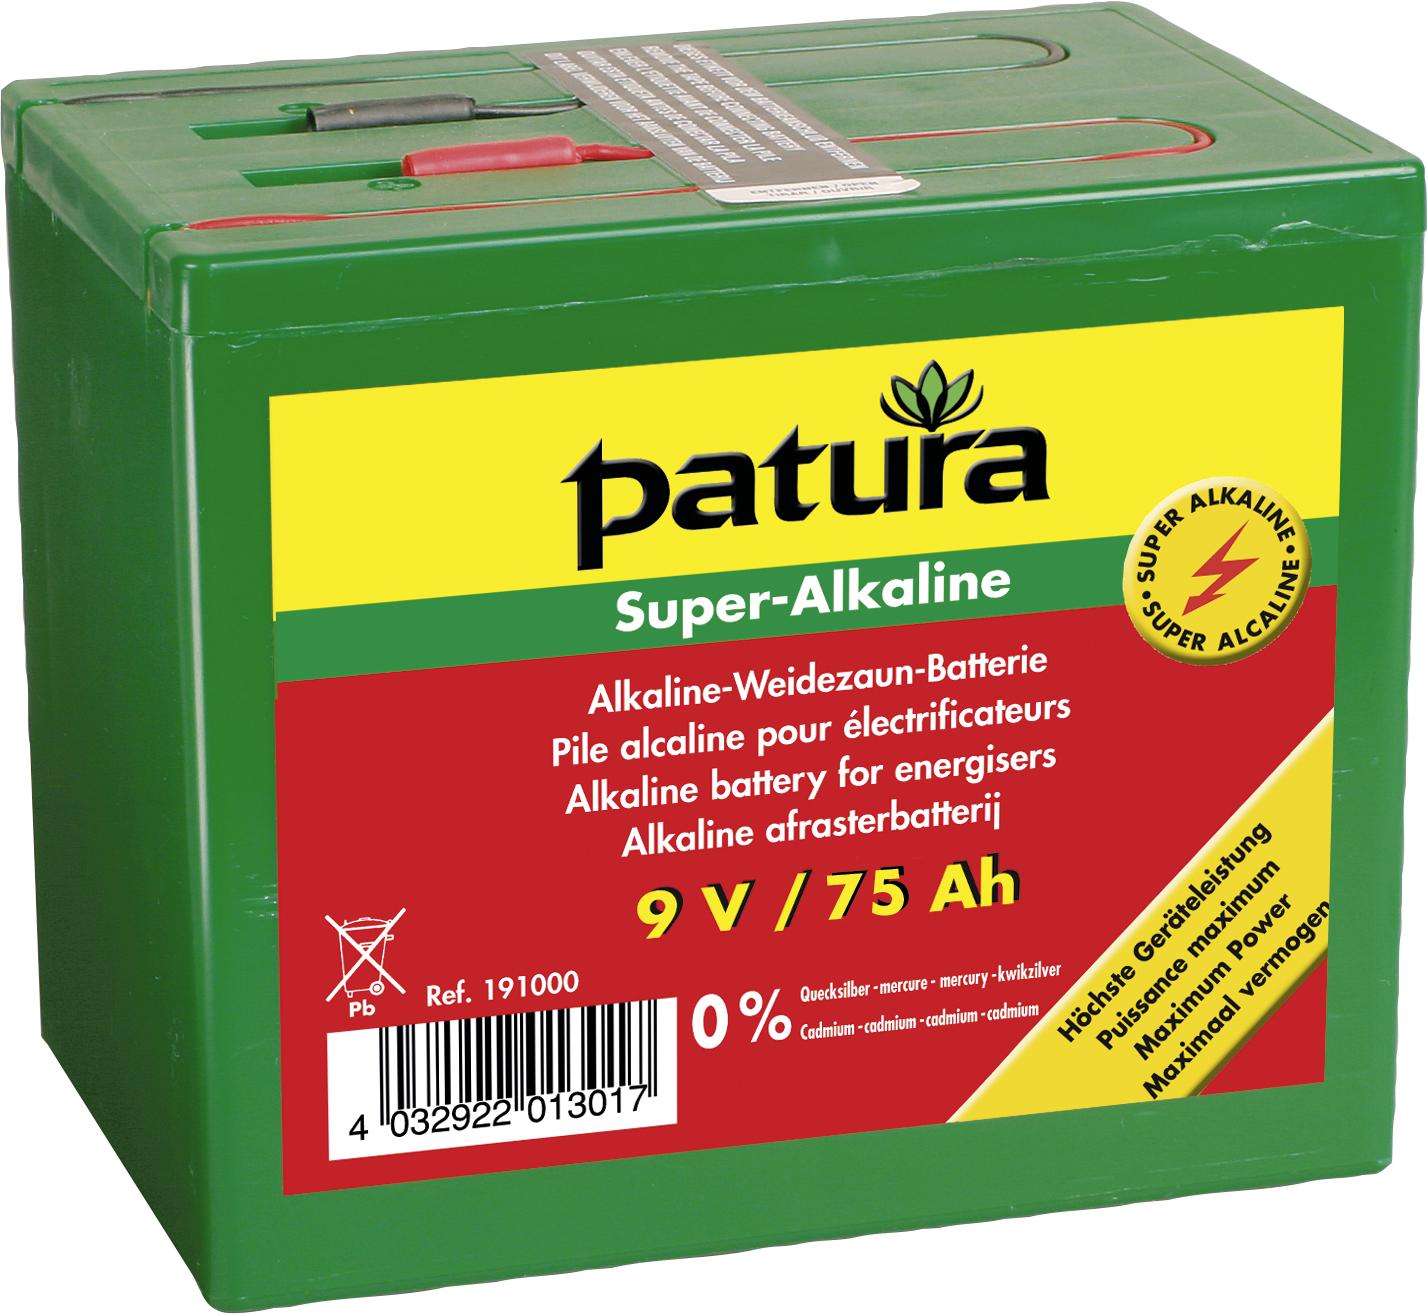 Super-Alkaline Weidezaun-Batterie